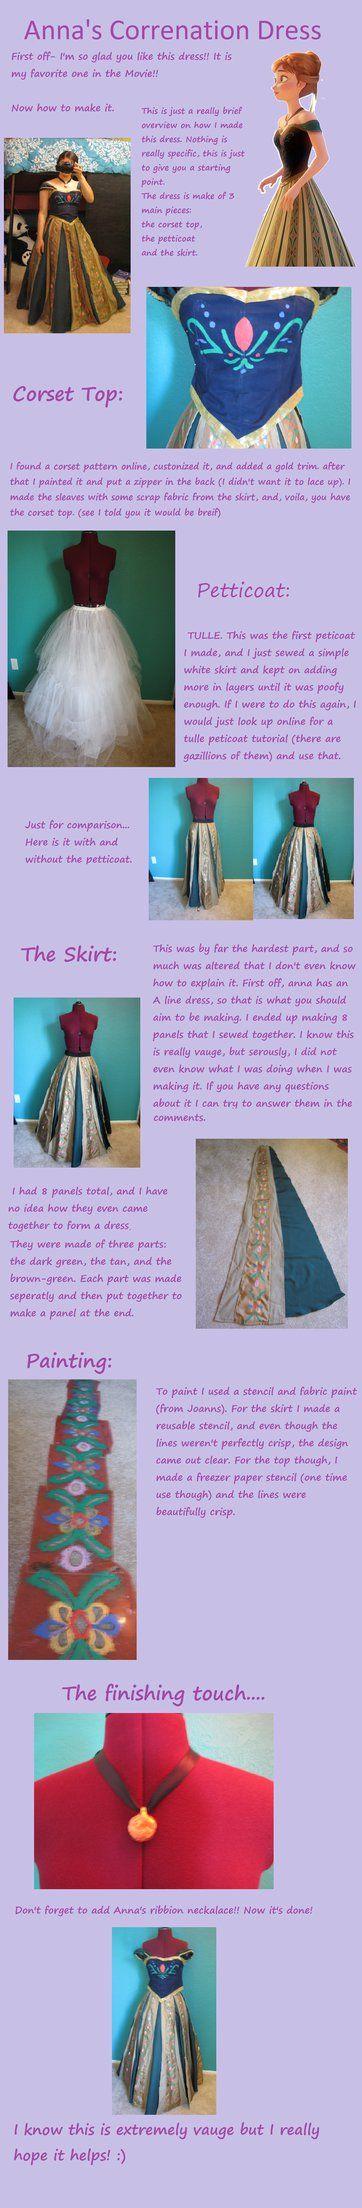 Frozen: Anna Coronation Dress Overview/Tutorial by BooksArtDance